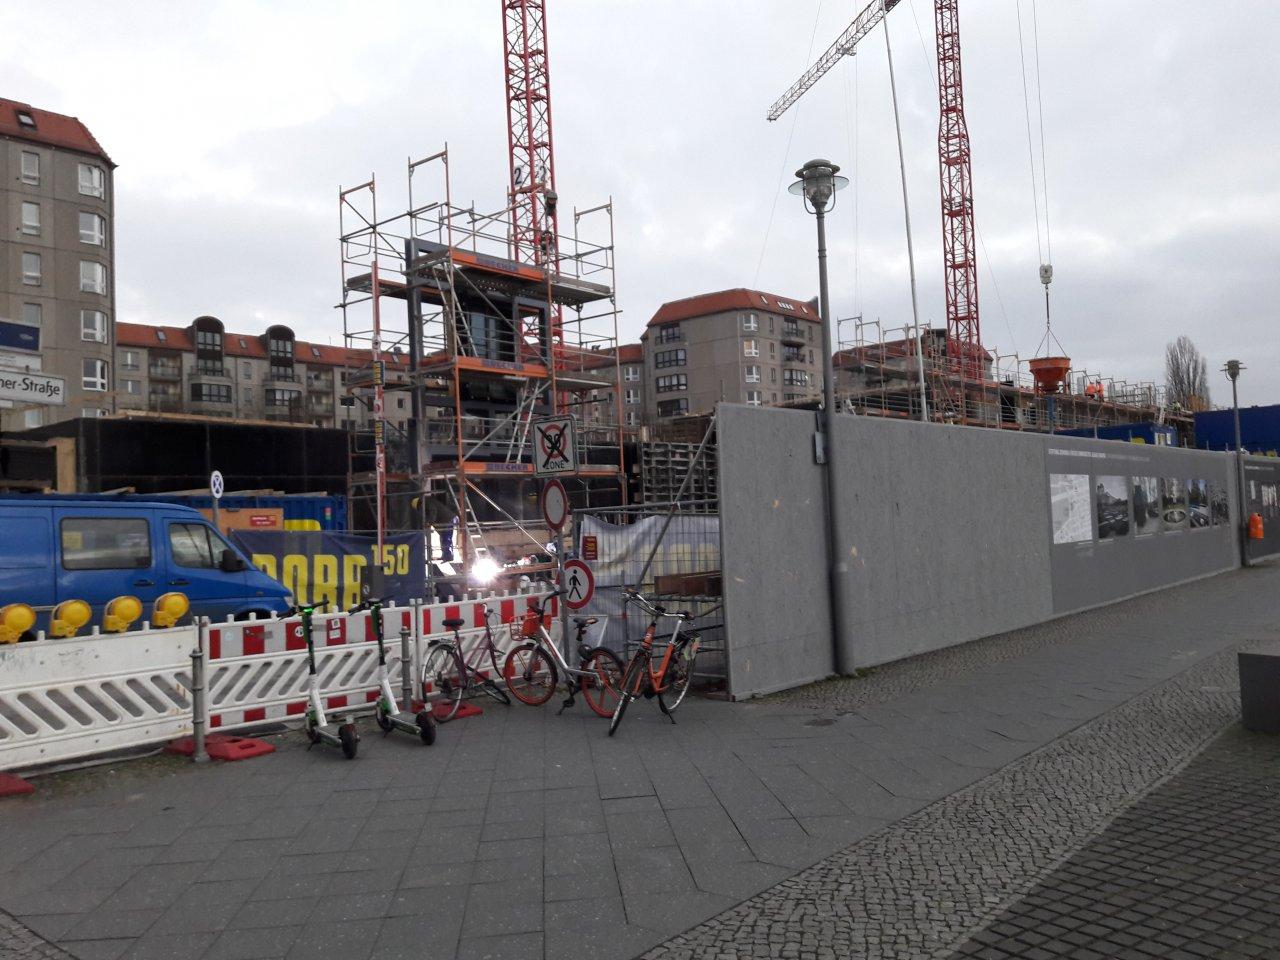 MUc-Real-berlin.jpg